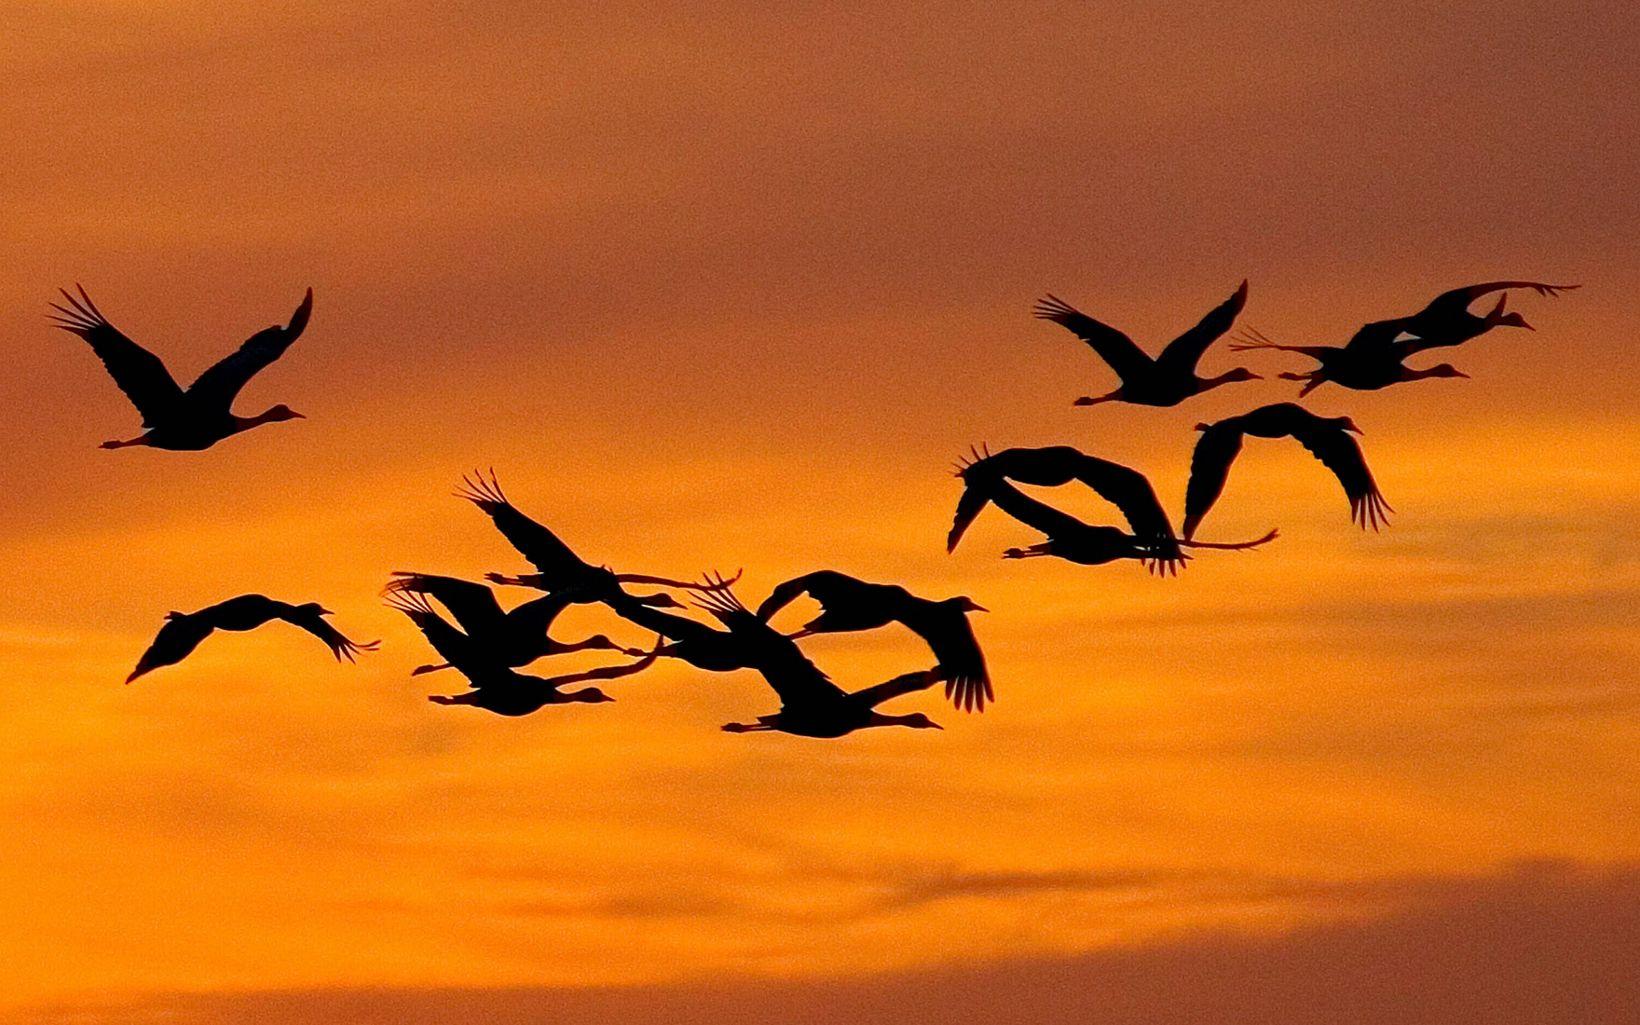 silhouettes of sandhill cranes in flight in an orange sky